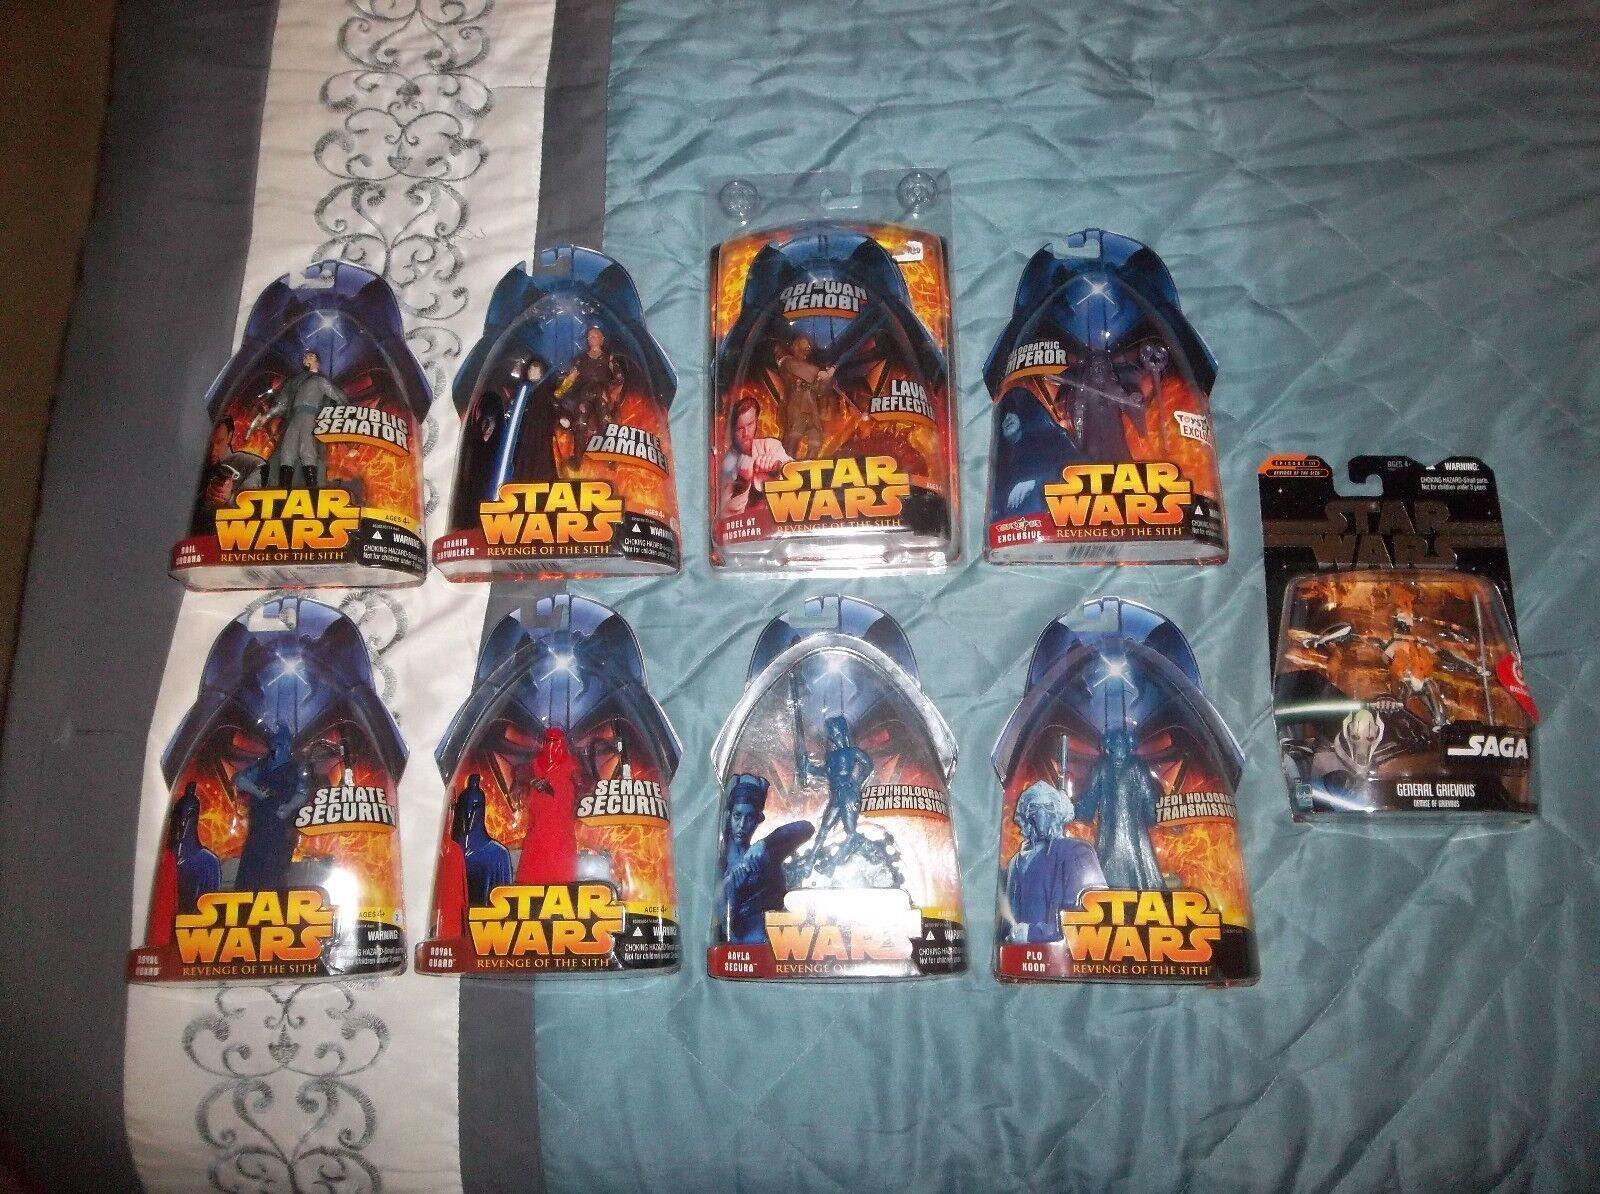 Star Wars Ep 3 Lot Obi-Wan Anakin Vader Guard Secura Koon Grievous Emperor Org